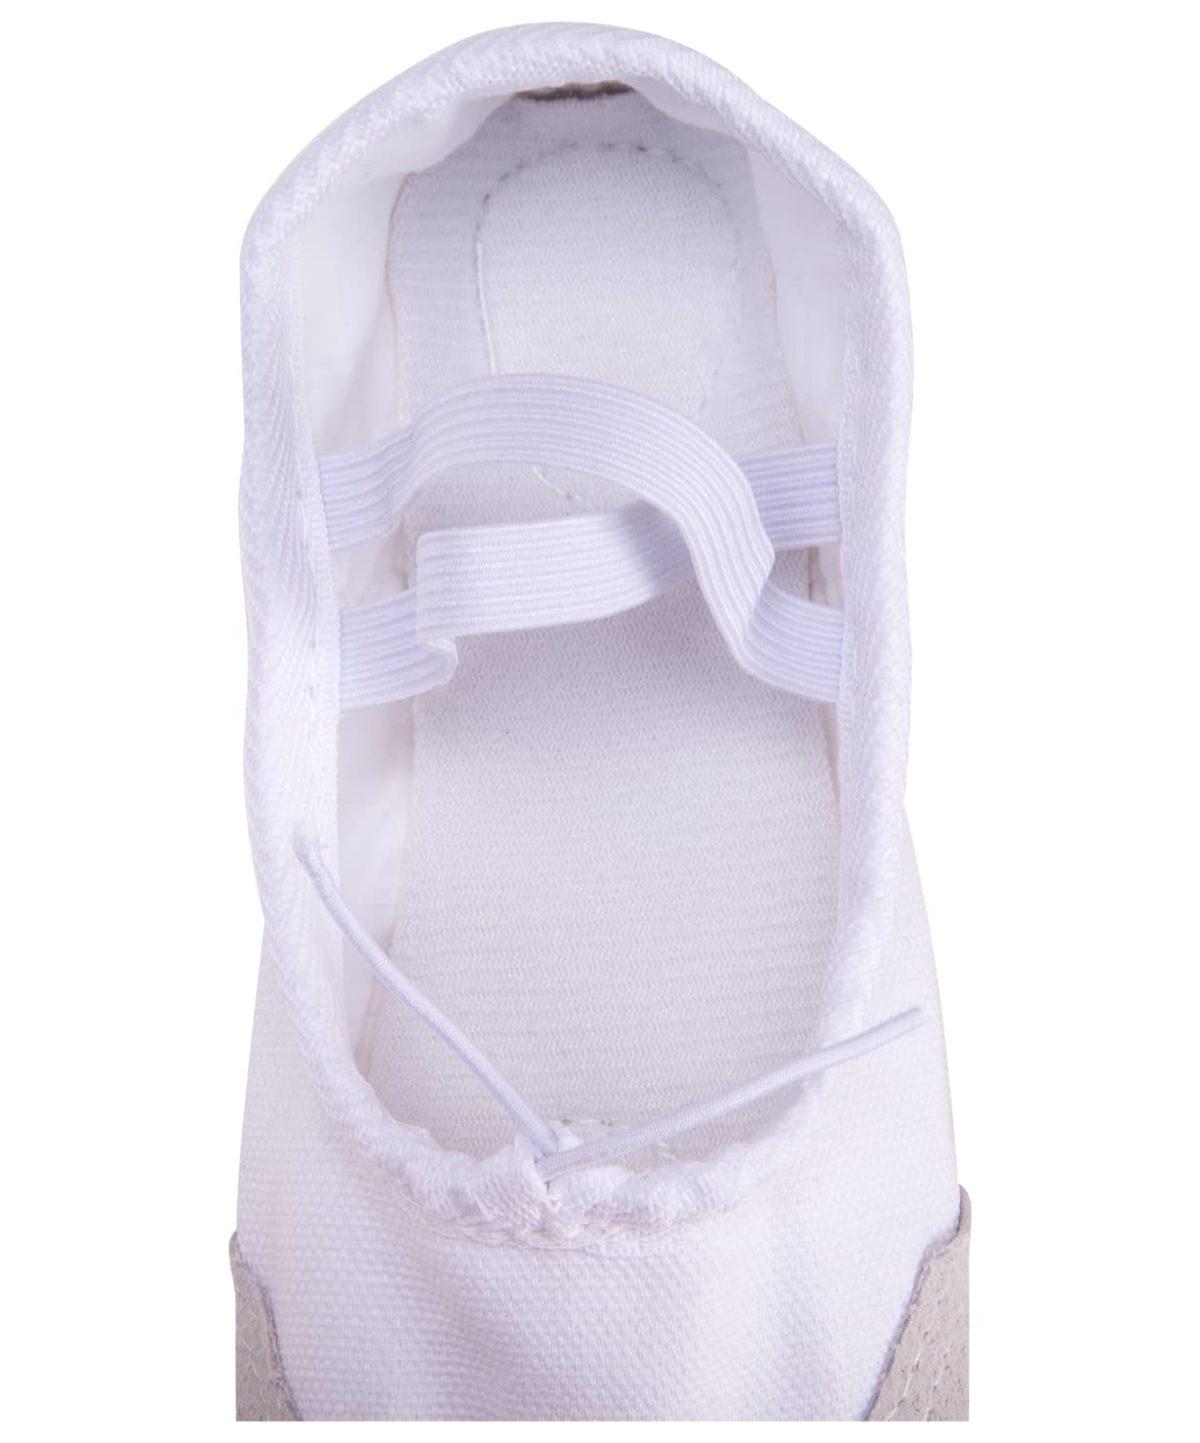 AMELY Балетки текстиль (32-37)  SL-01: белый - 2